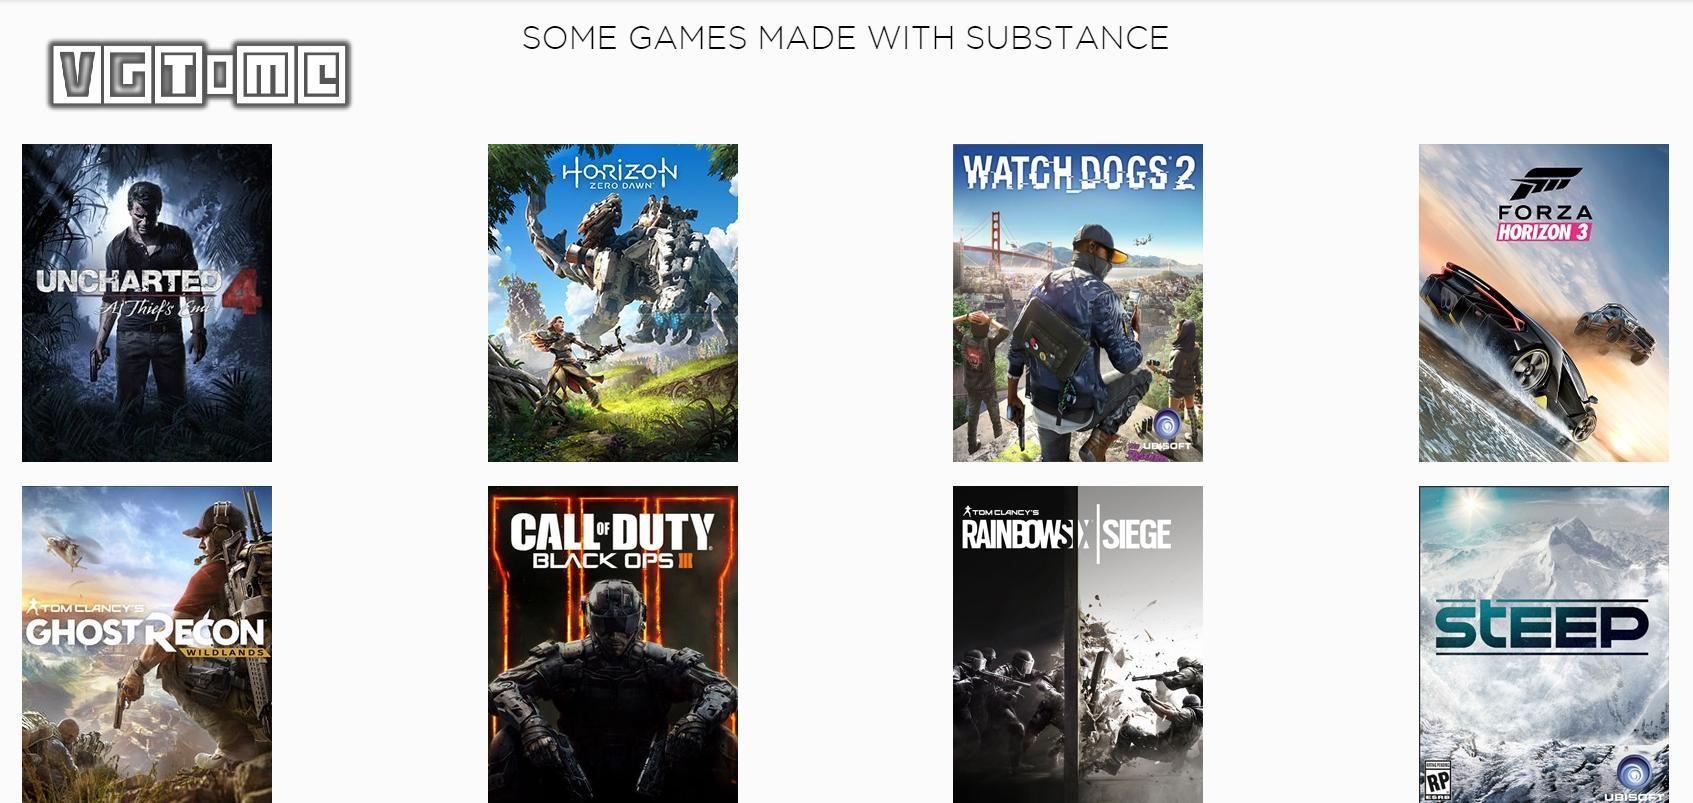 Substance公司产品参与的部分游戏项目